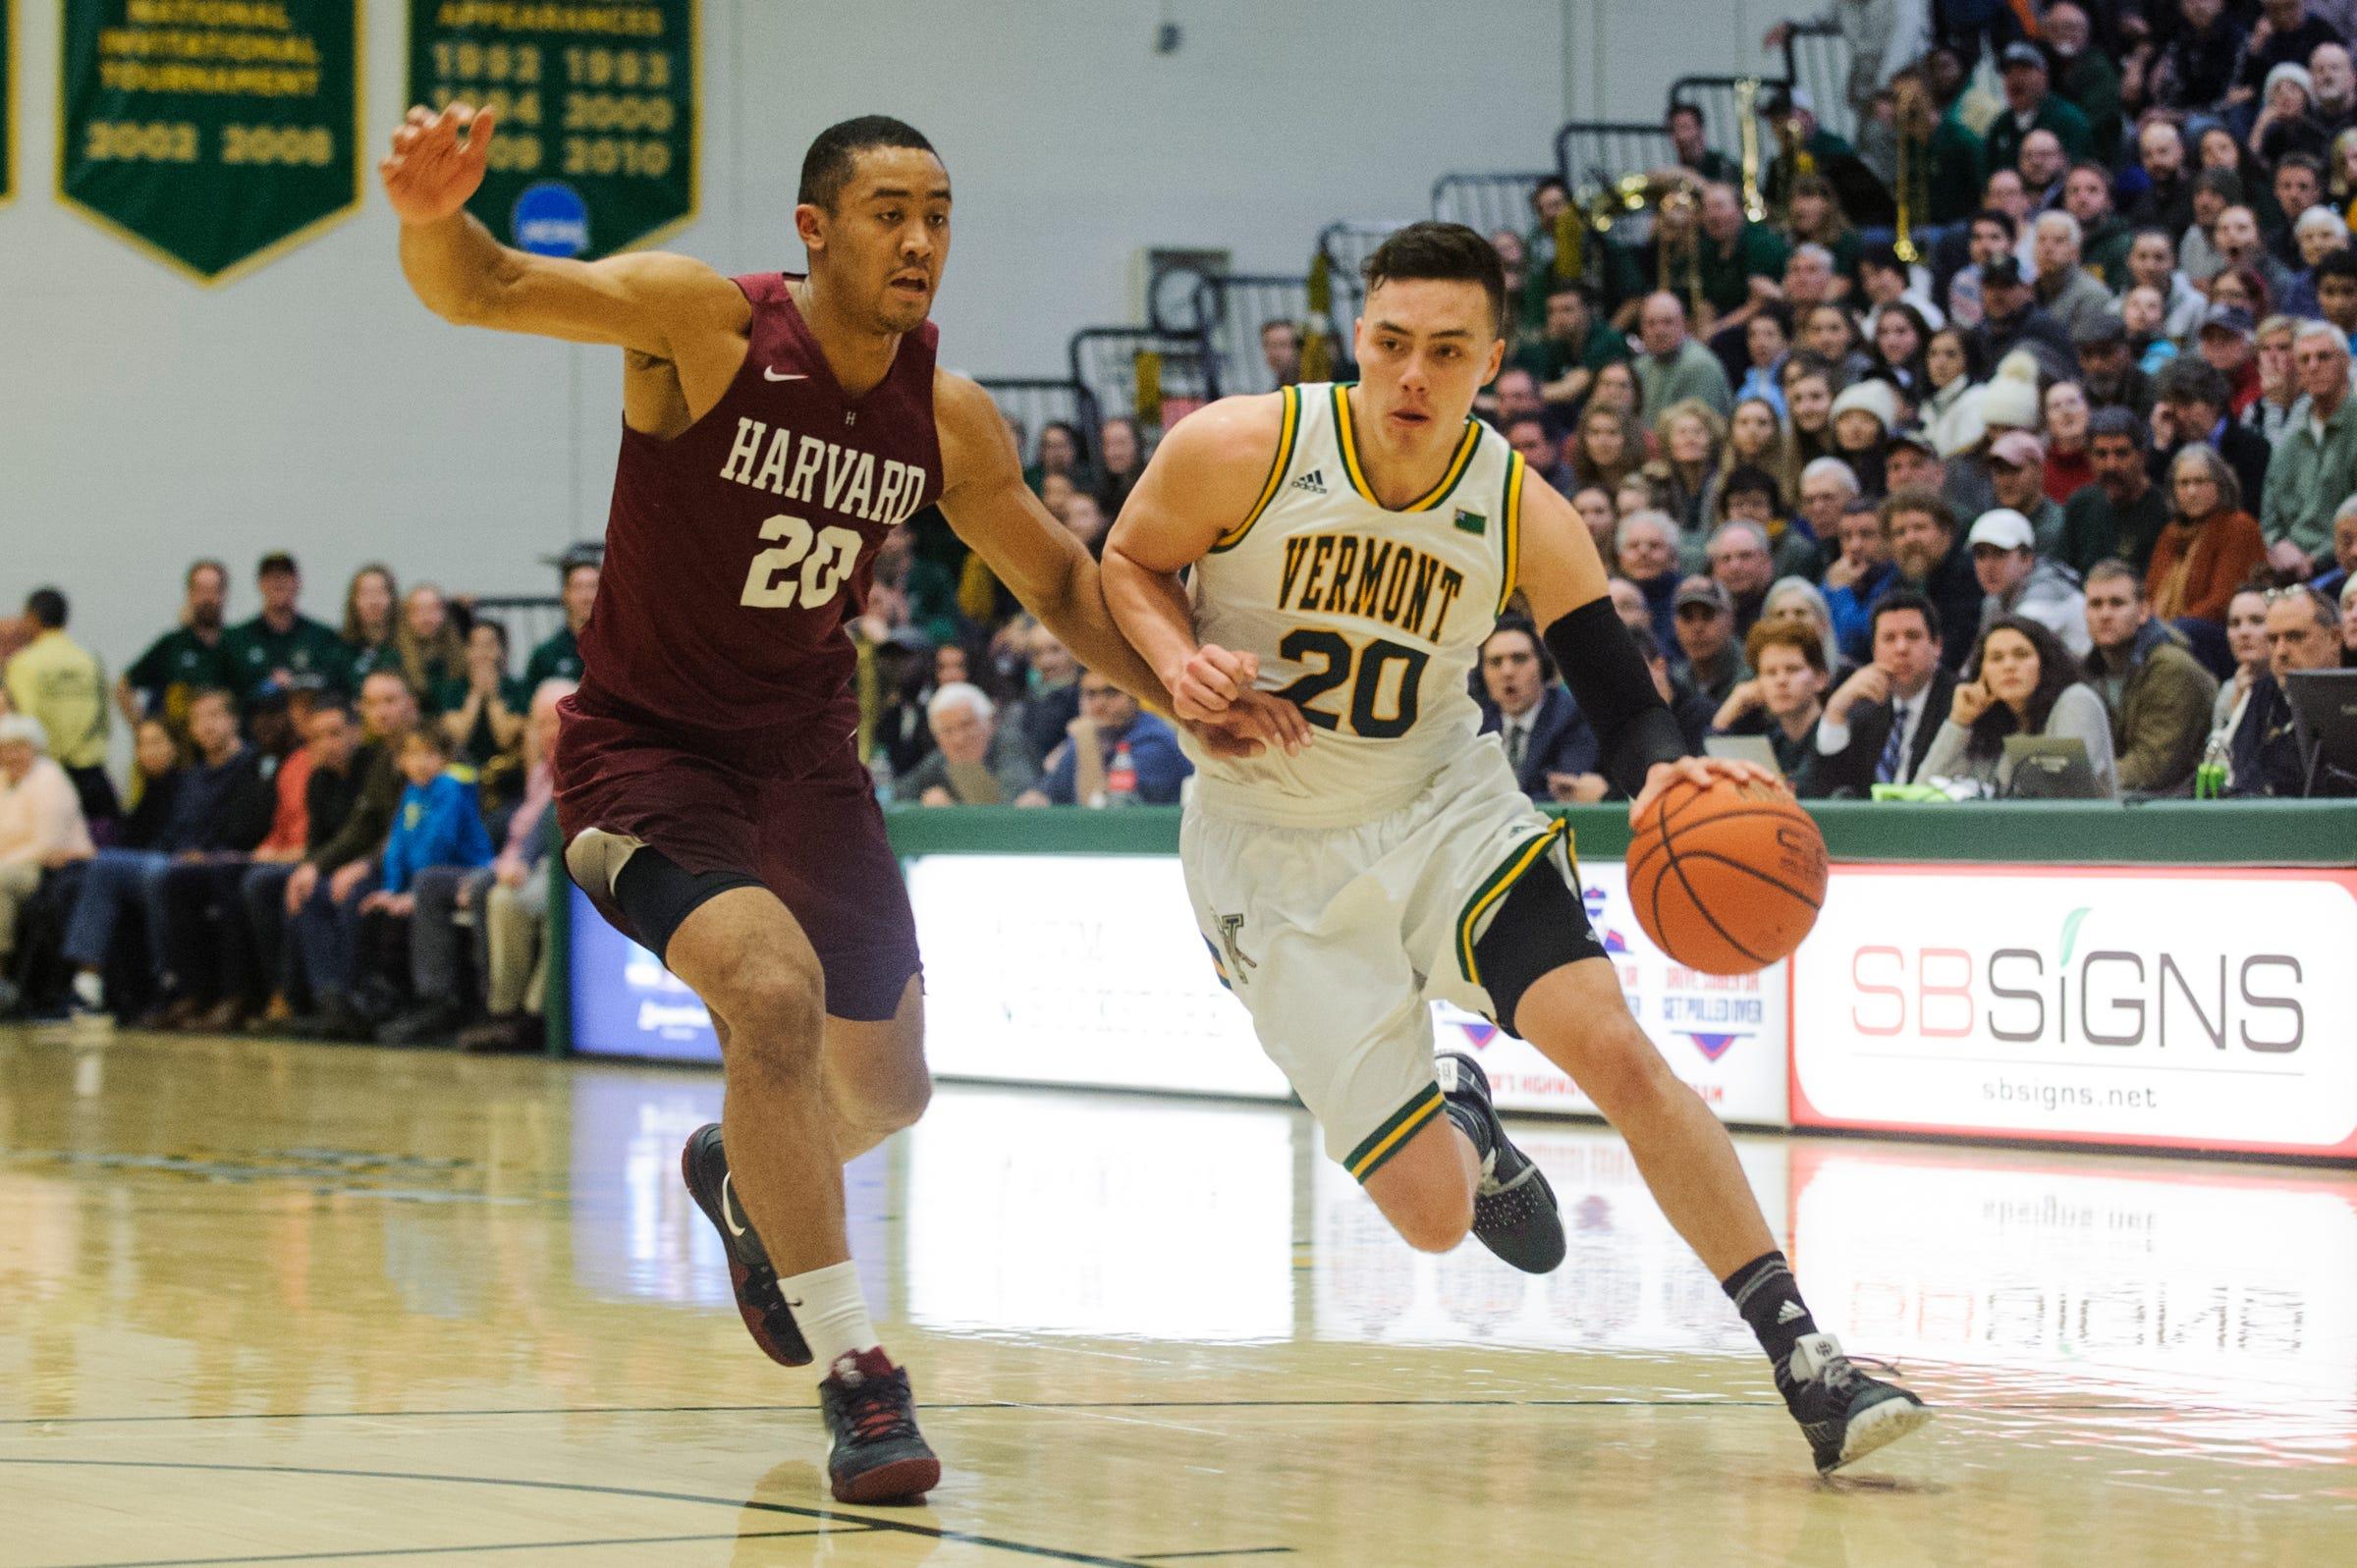 UVM men's basketball seeks to end skid vs. Northeastern   Burlington Free Press